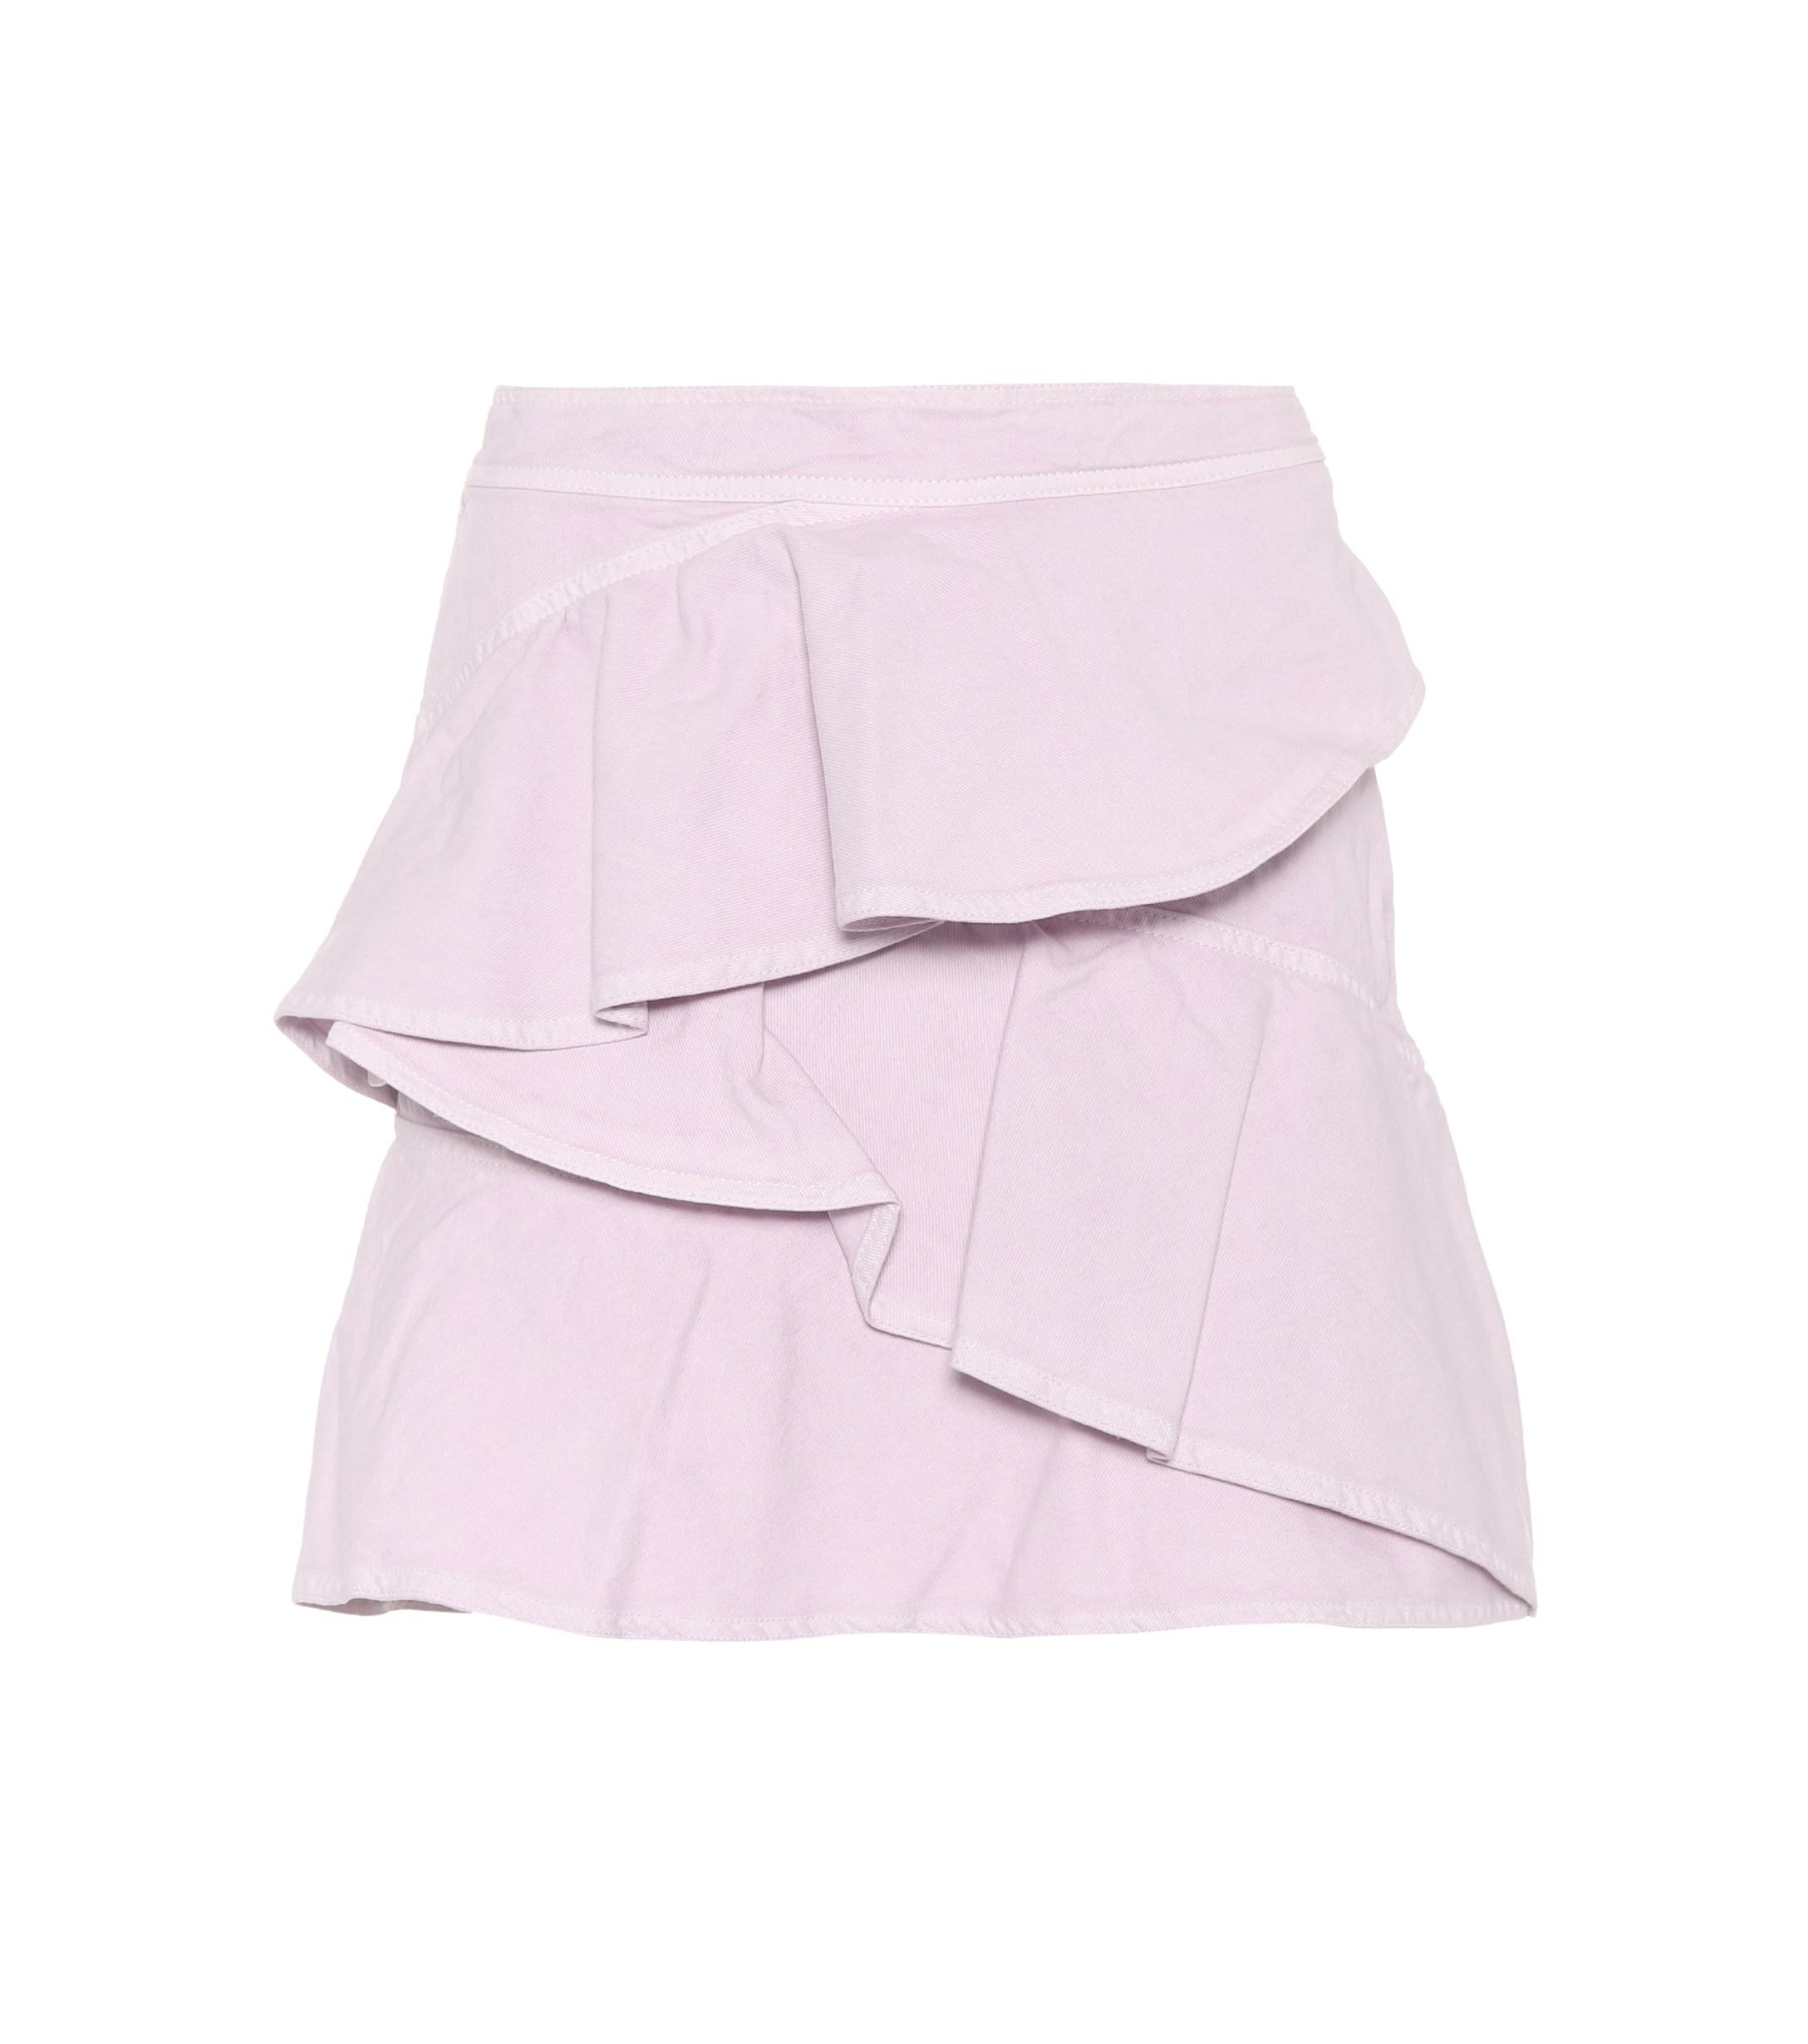 d96e2af4b Lyst - Étoile Isabel Marant Coati Cotton Miniskirt in Pink